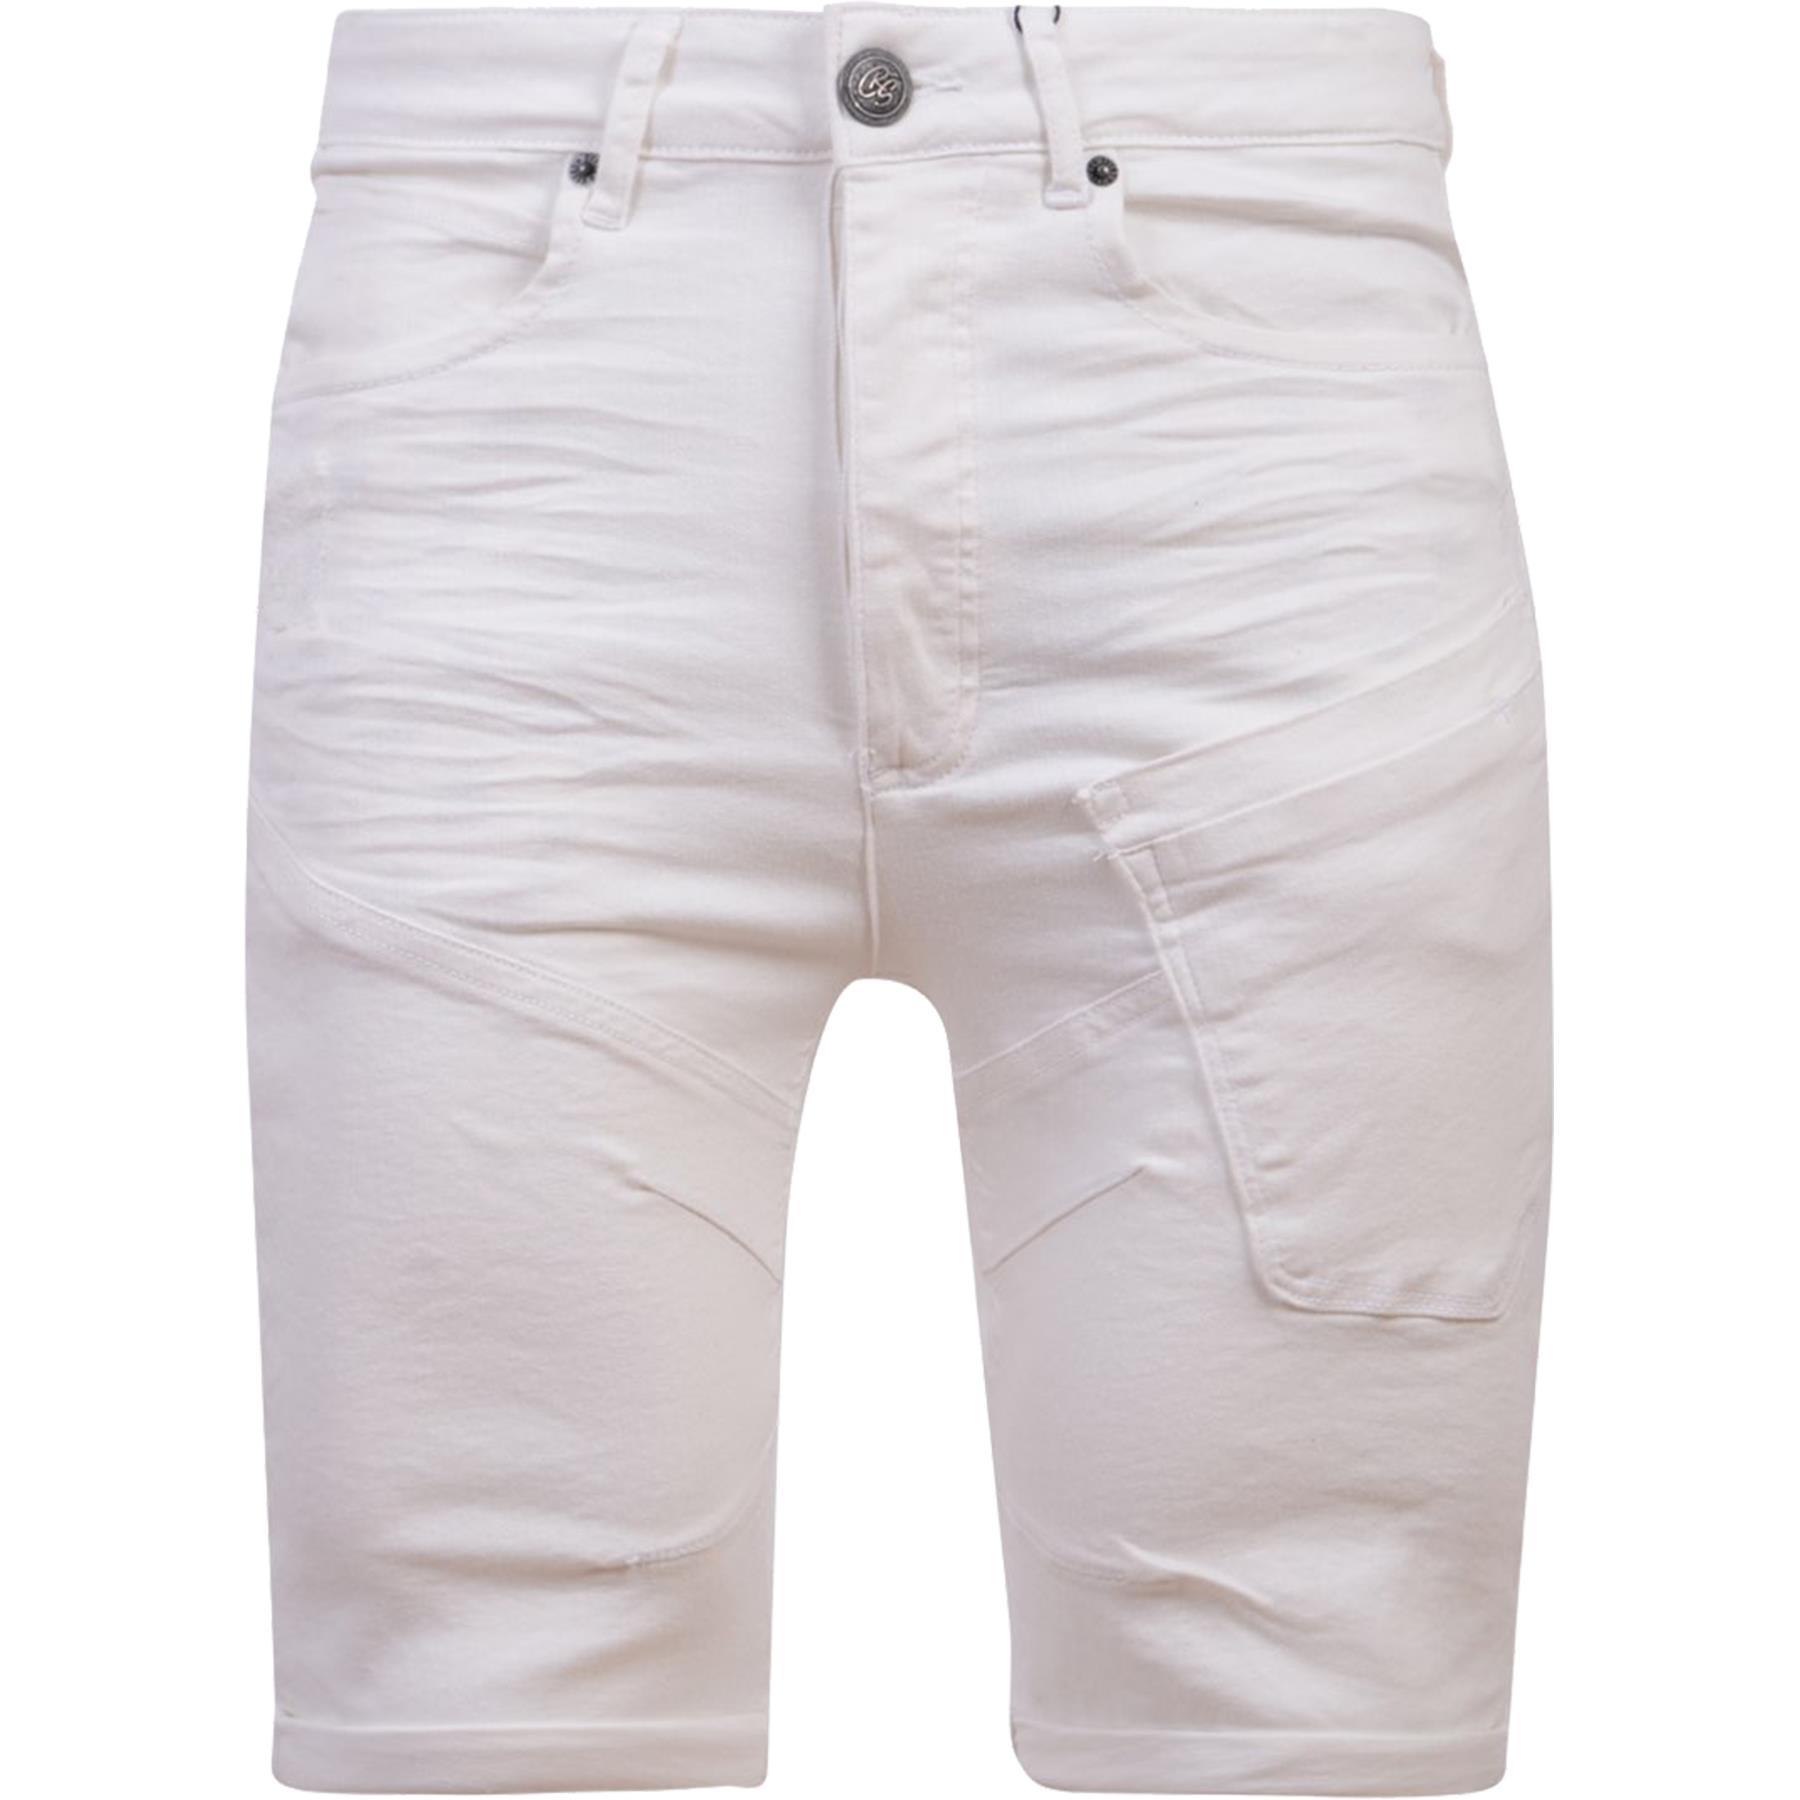 New-Mens-Crosshatch-Canvas-Cargo-Denim-Camo-Shorts-Chino-2019-Styles-30-42-034 thumbnail 54